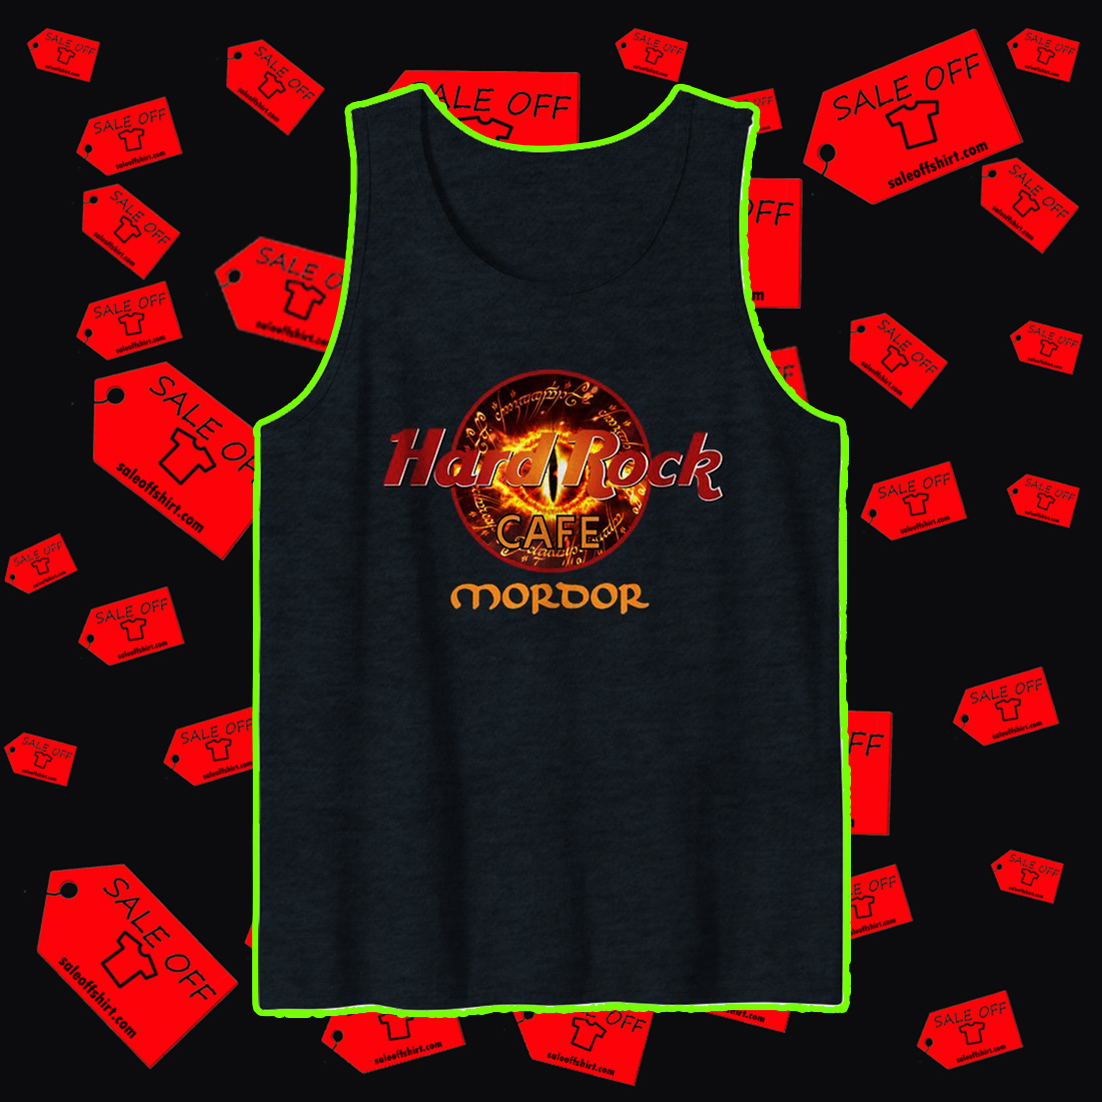 Hard Rock Cafe Mordor tank top